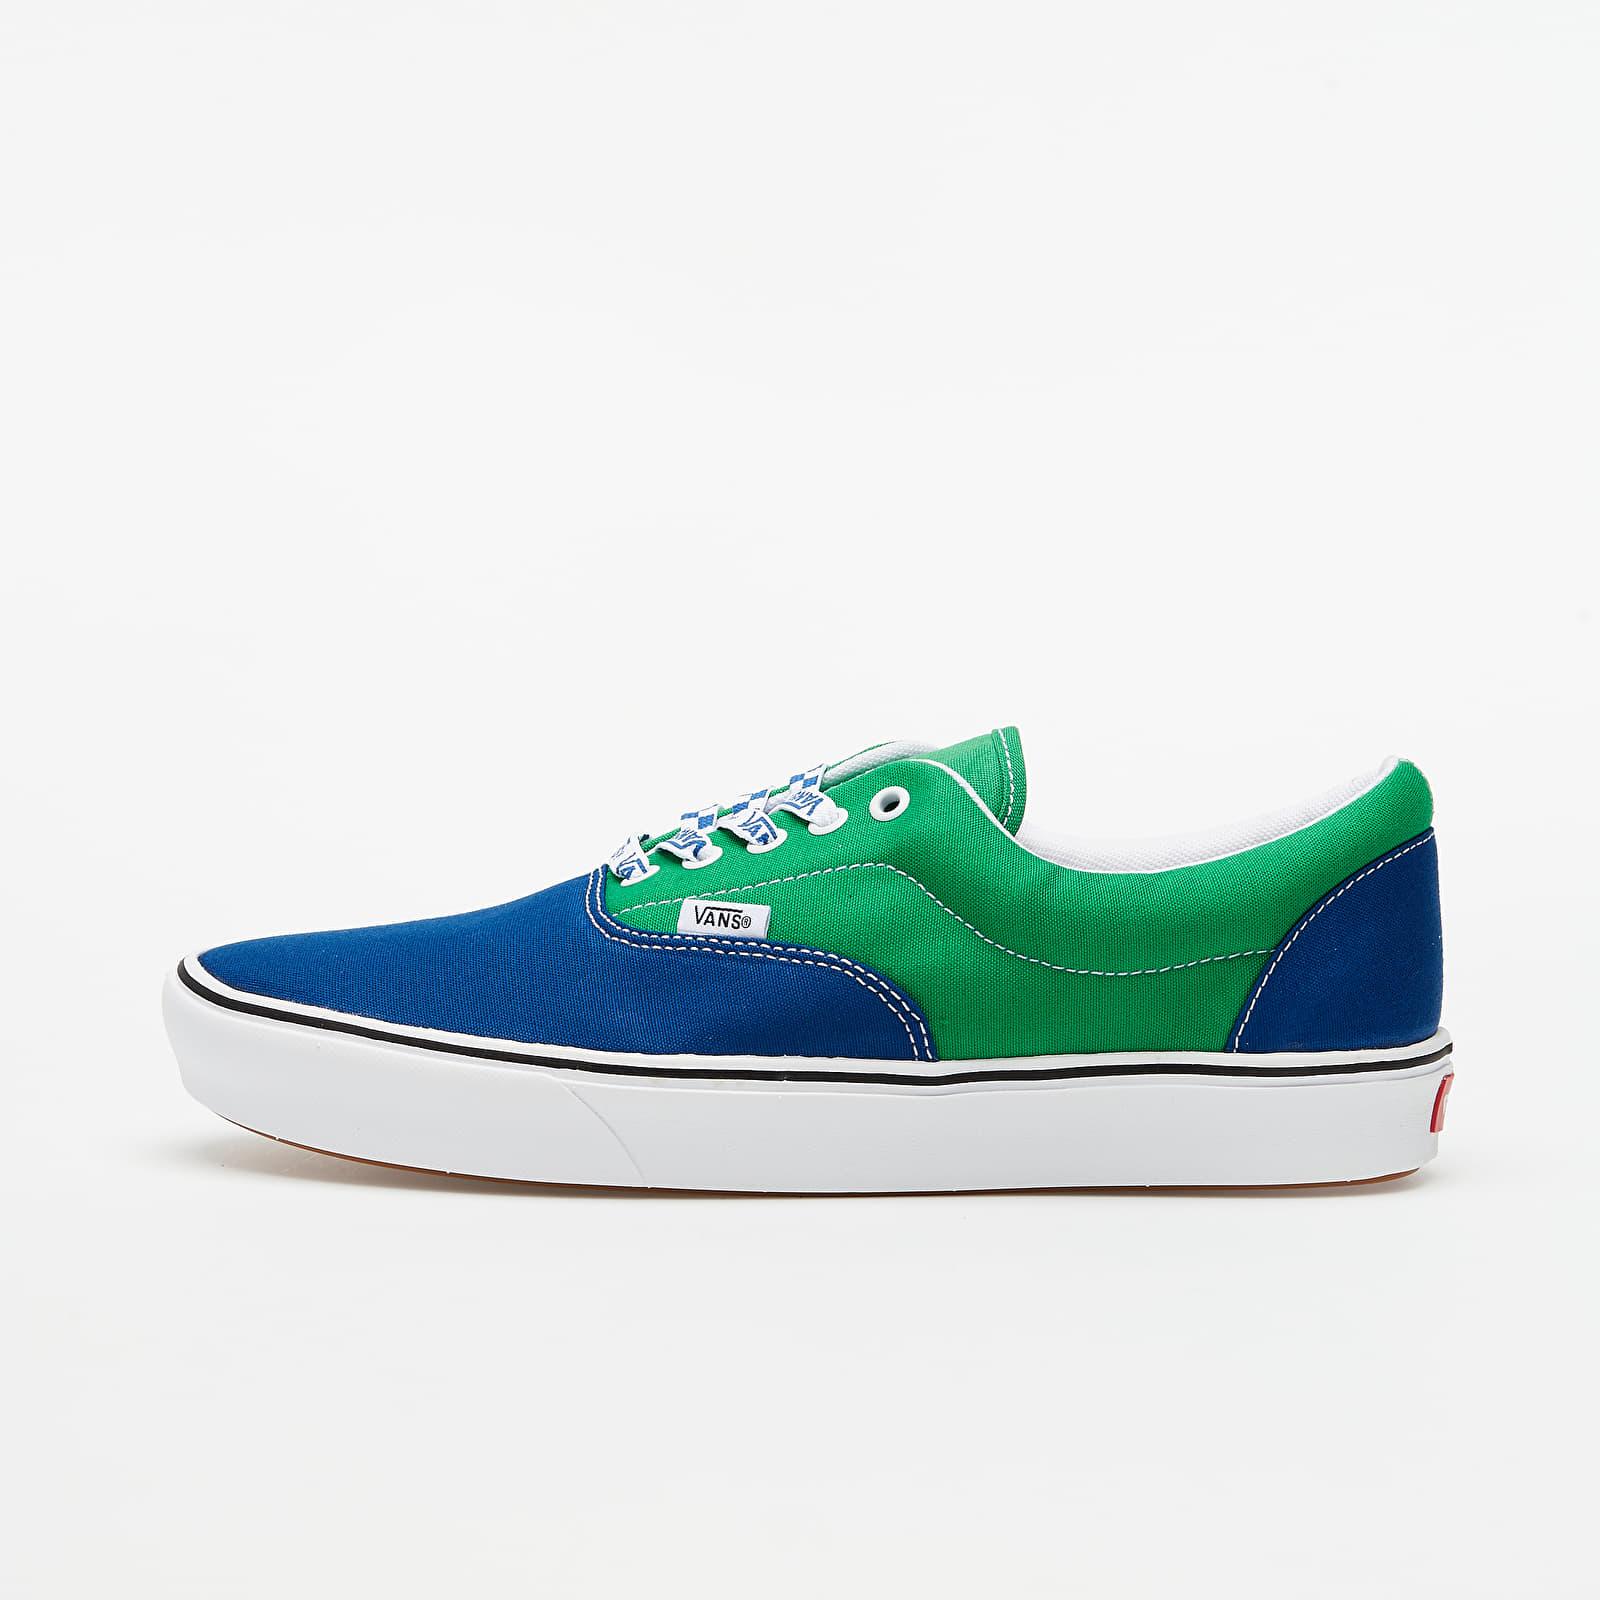 Muške tenisice Vans ComfyCush Era (Lace Mix) True White/ Fern Green